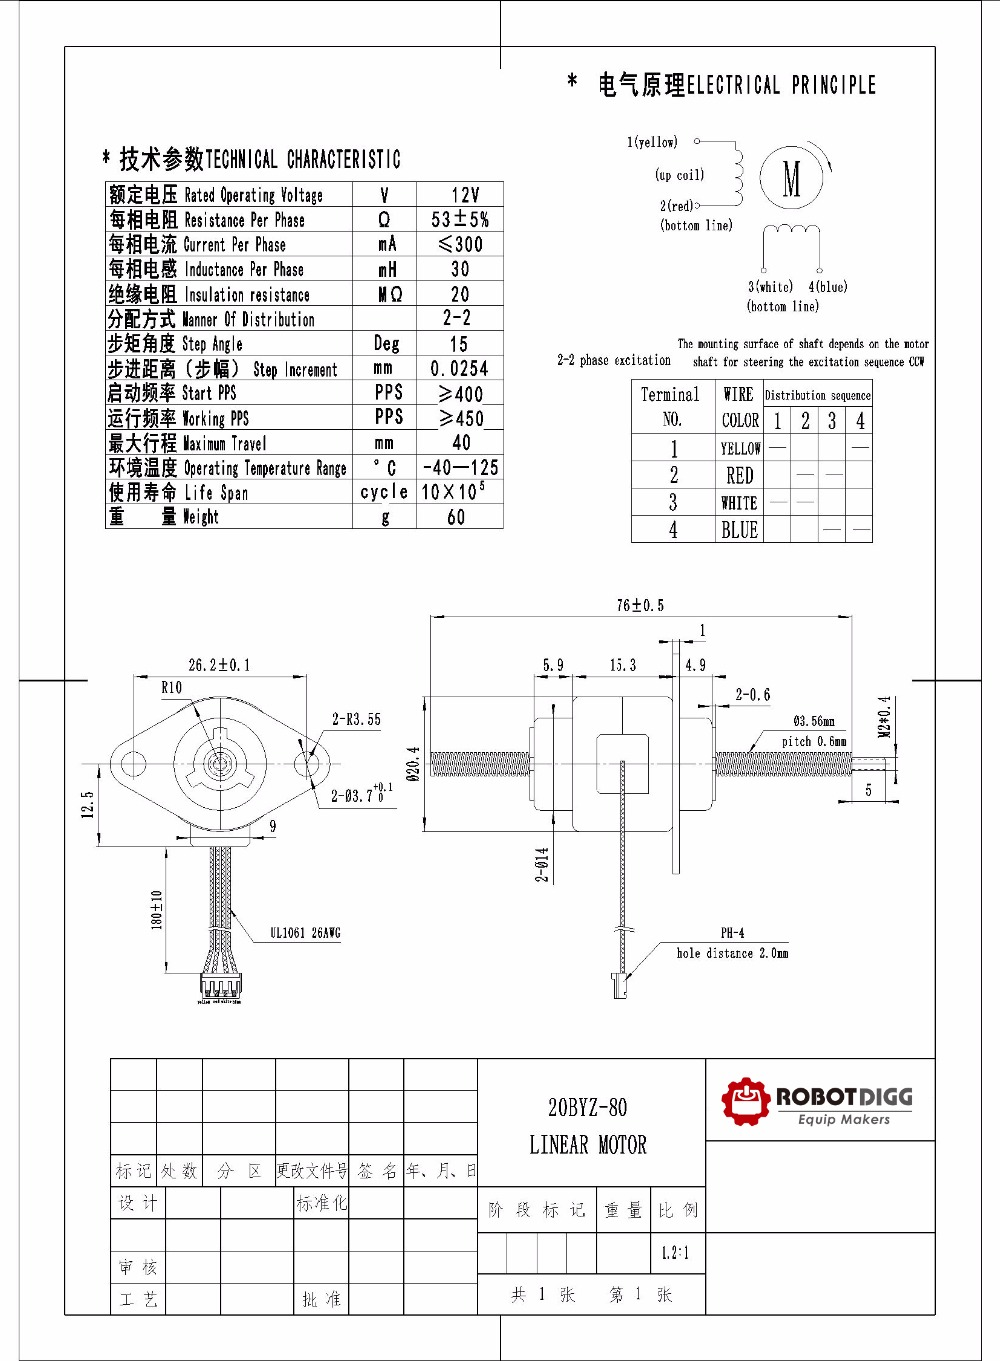 20 Non Captive Pm Stepper Motor Linear Actuator In 220v Wiring Diagram Cbf3828b9ac6d8834fbed0cfeb99d521 20byz